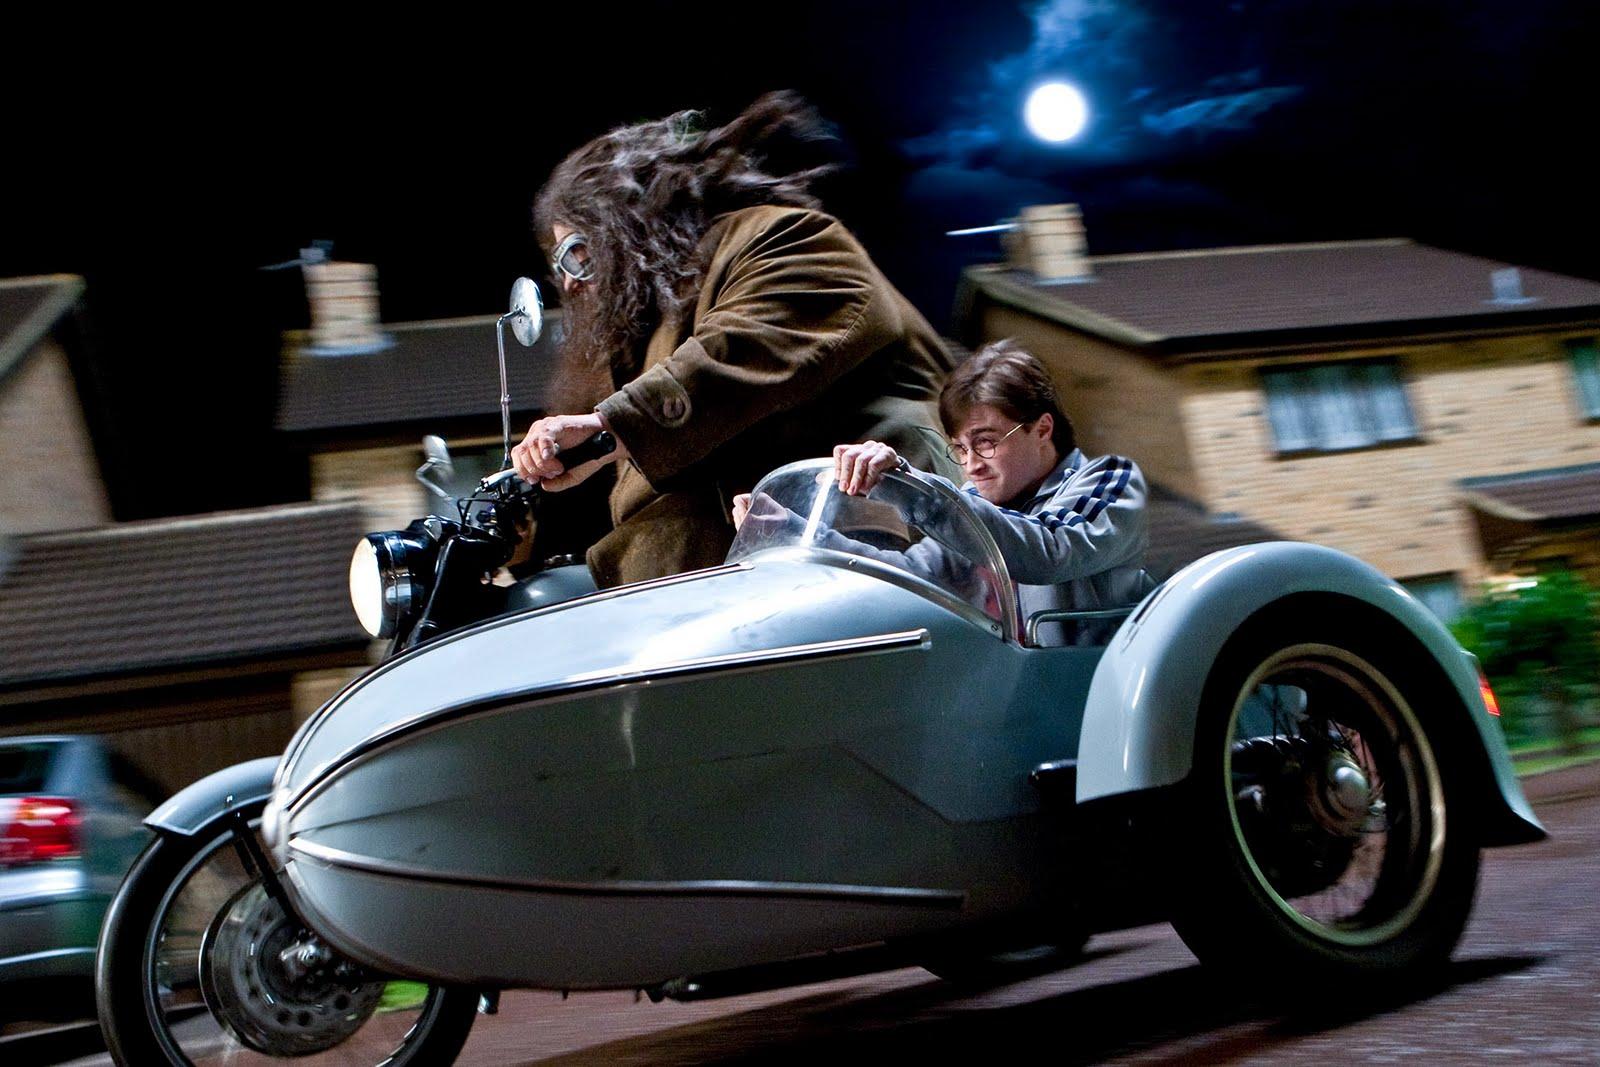 http://2.bp.blogspot.com/_2fdwksuATNA/TGopMuEHBkI/AAAAAAAAANU/XstvkqN0HKg/s1600/Harry-Potter-Deathly-Hallows-2.jpg